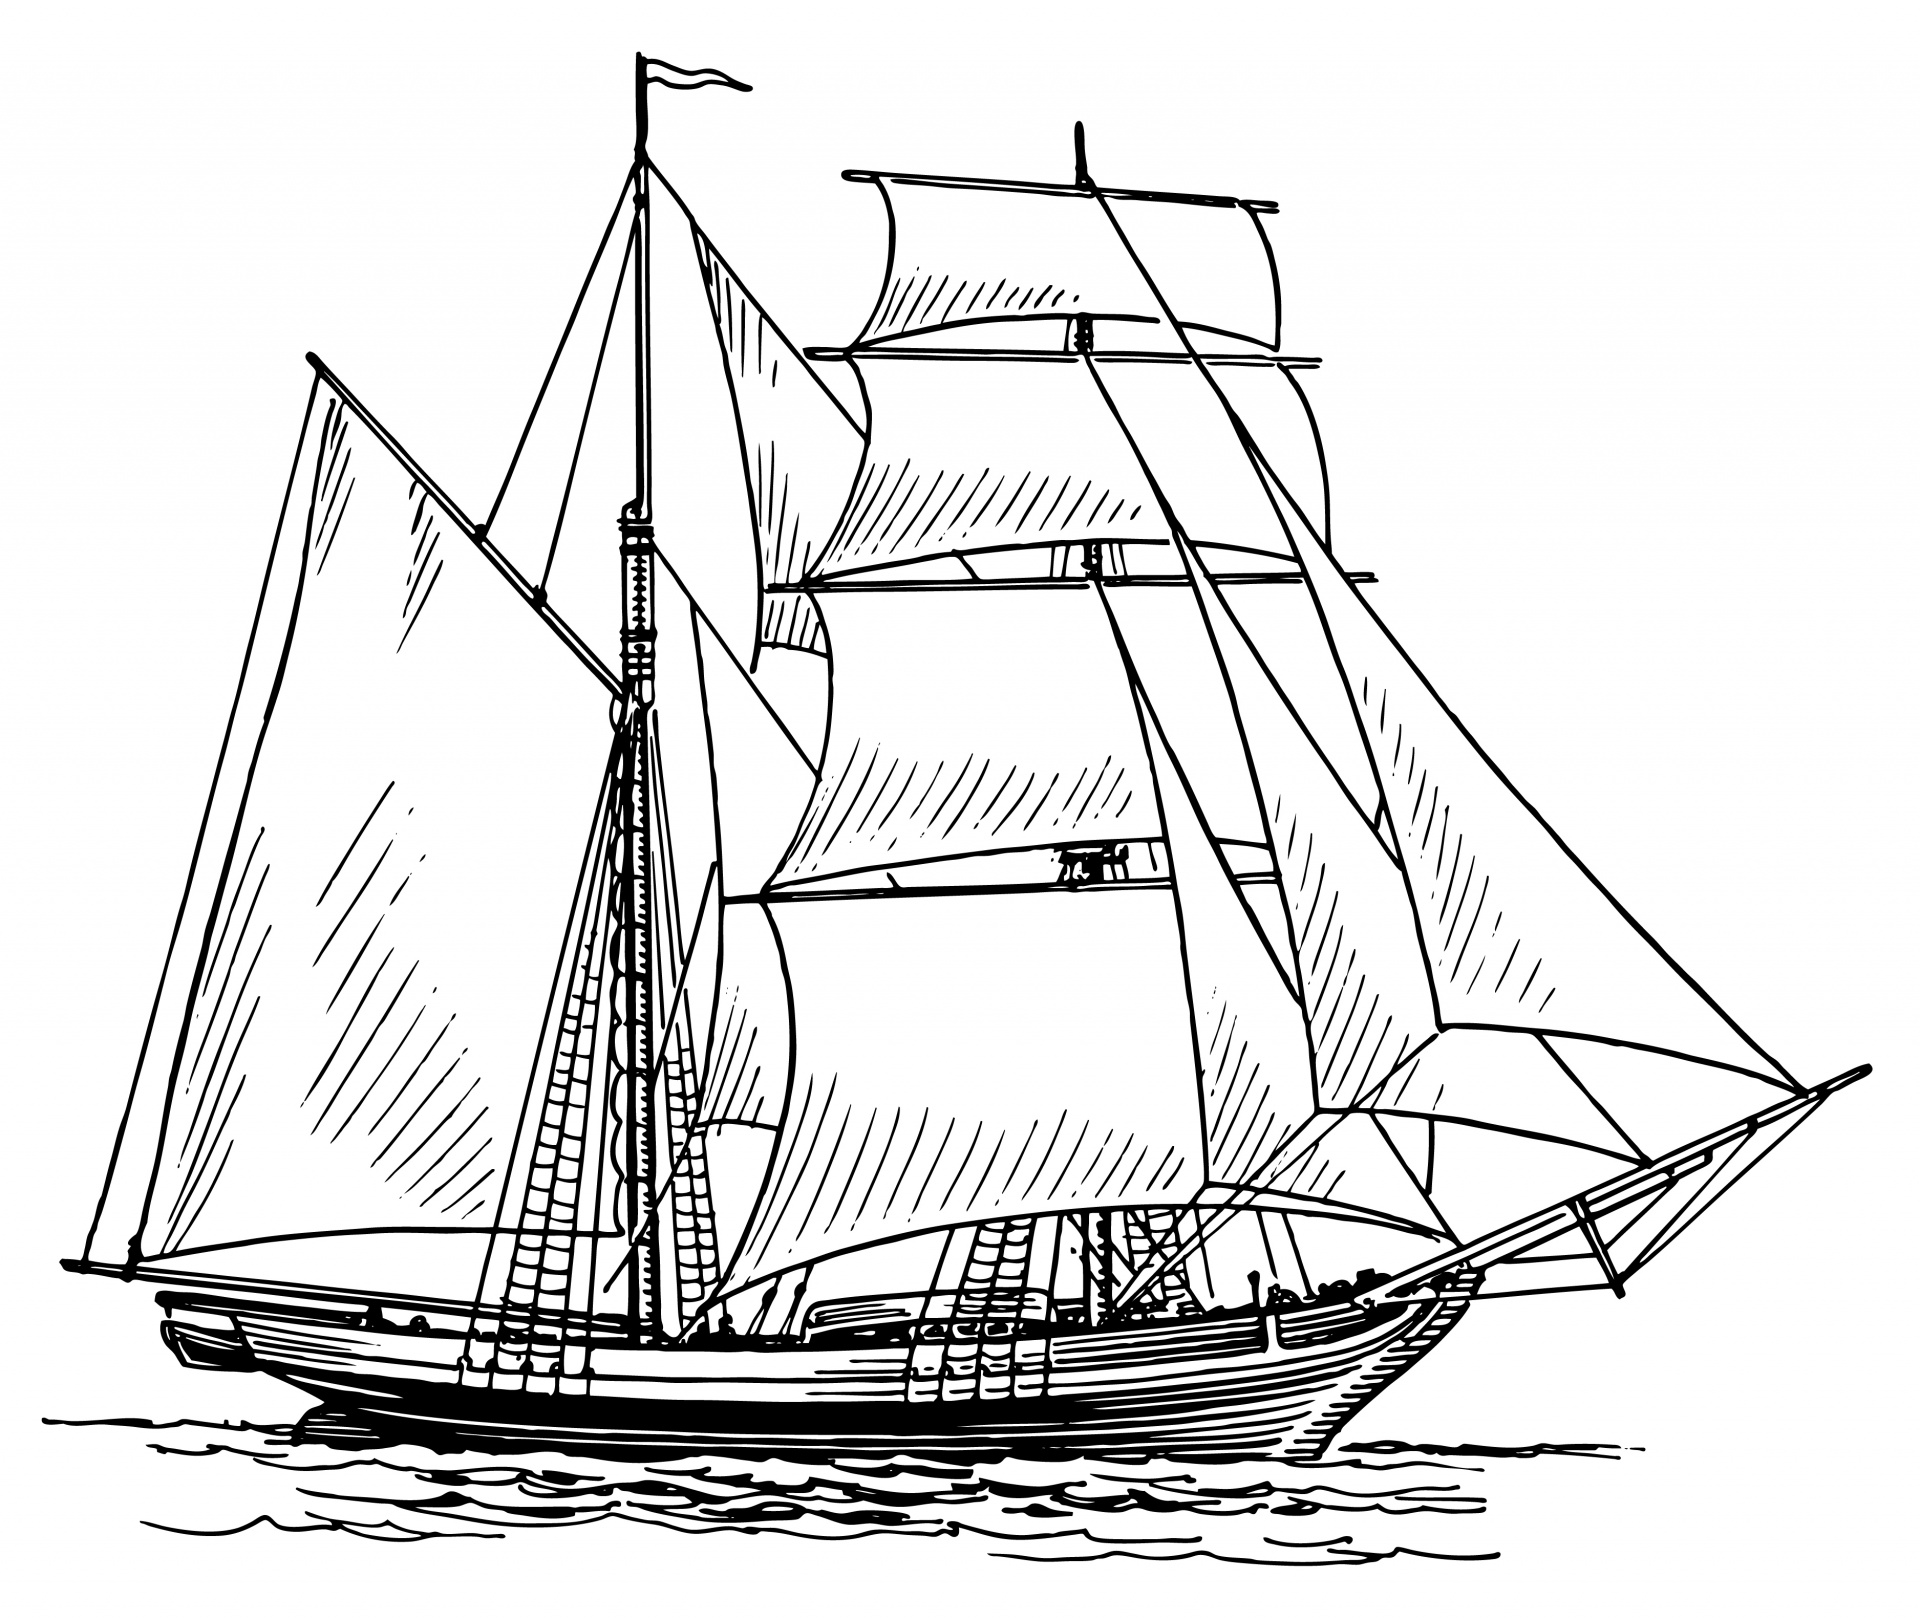 Anatomy of a Ship.